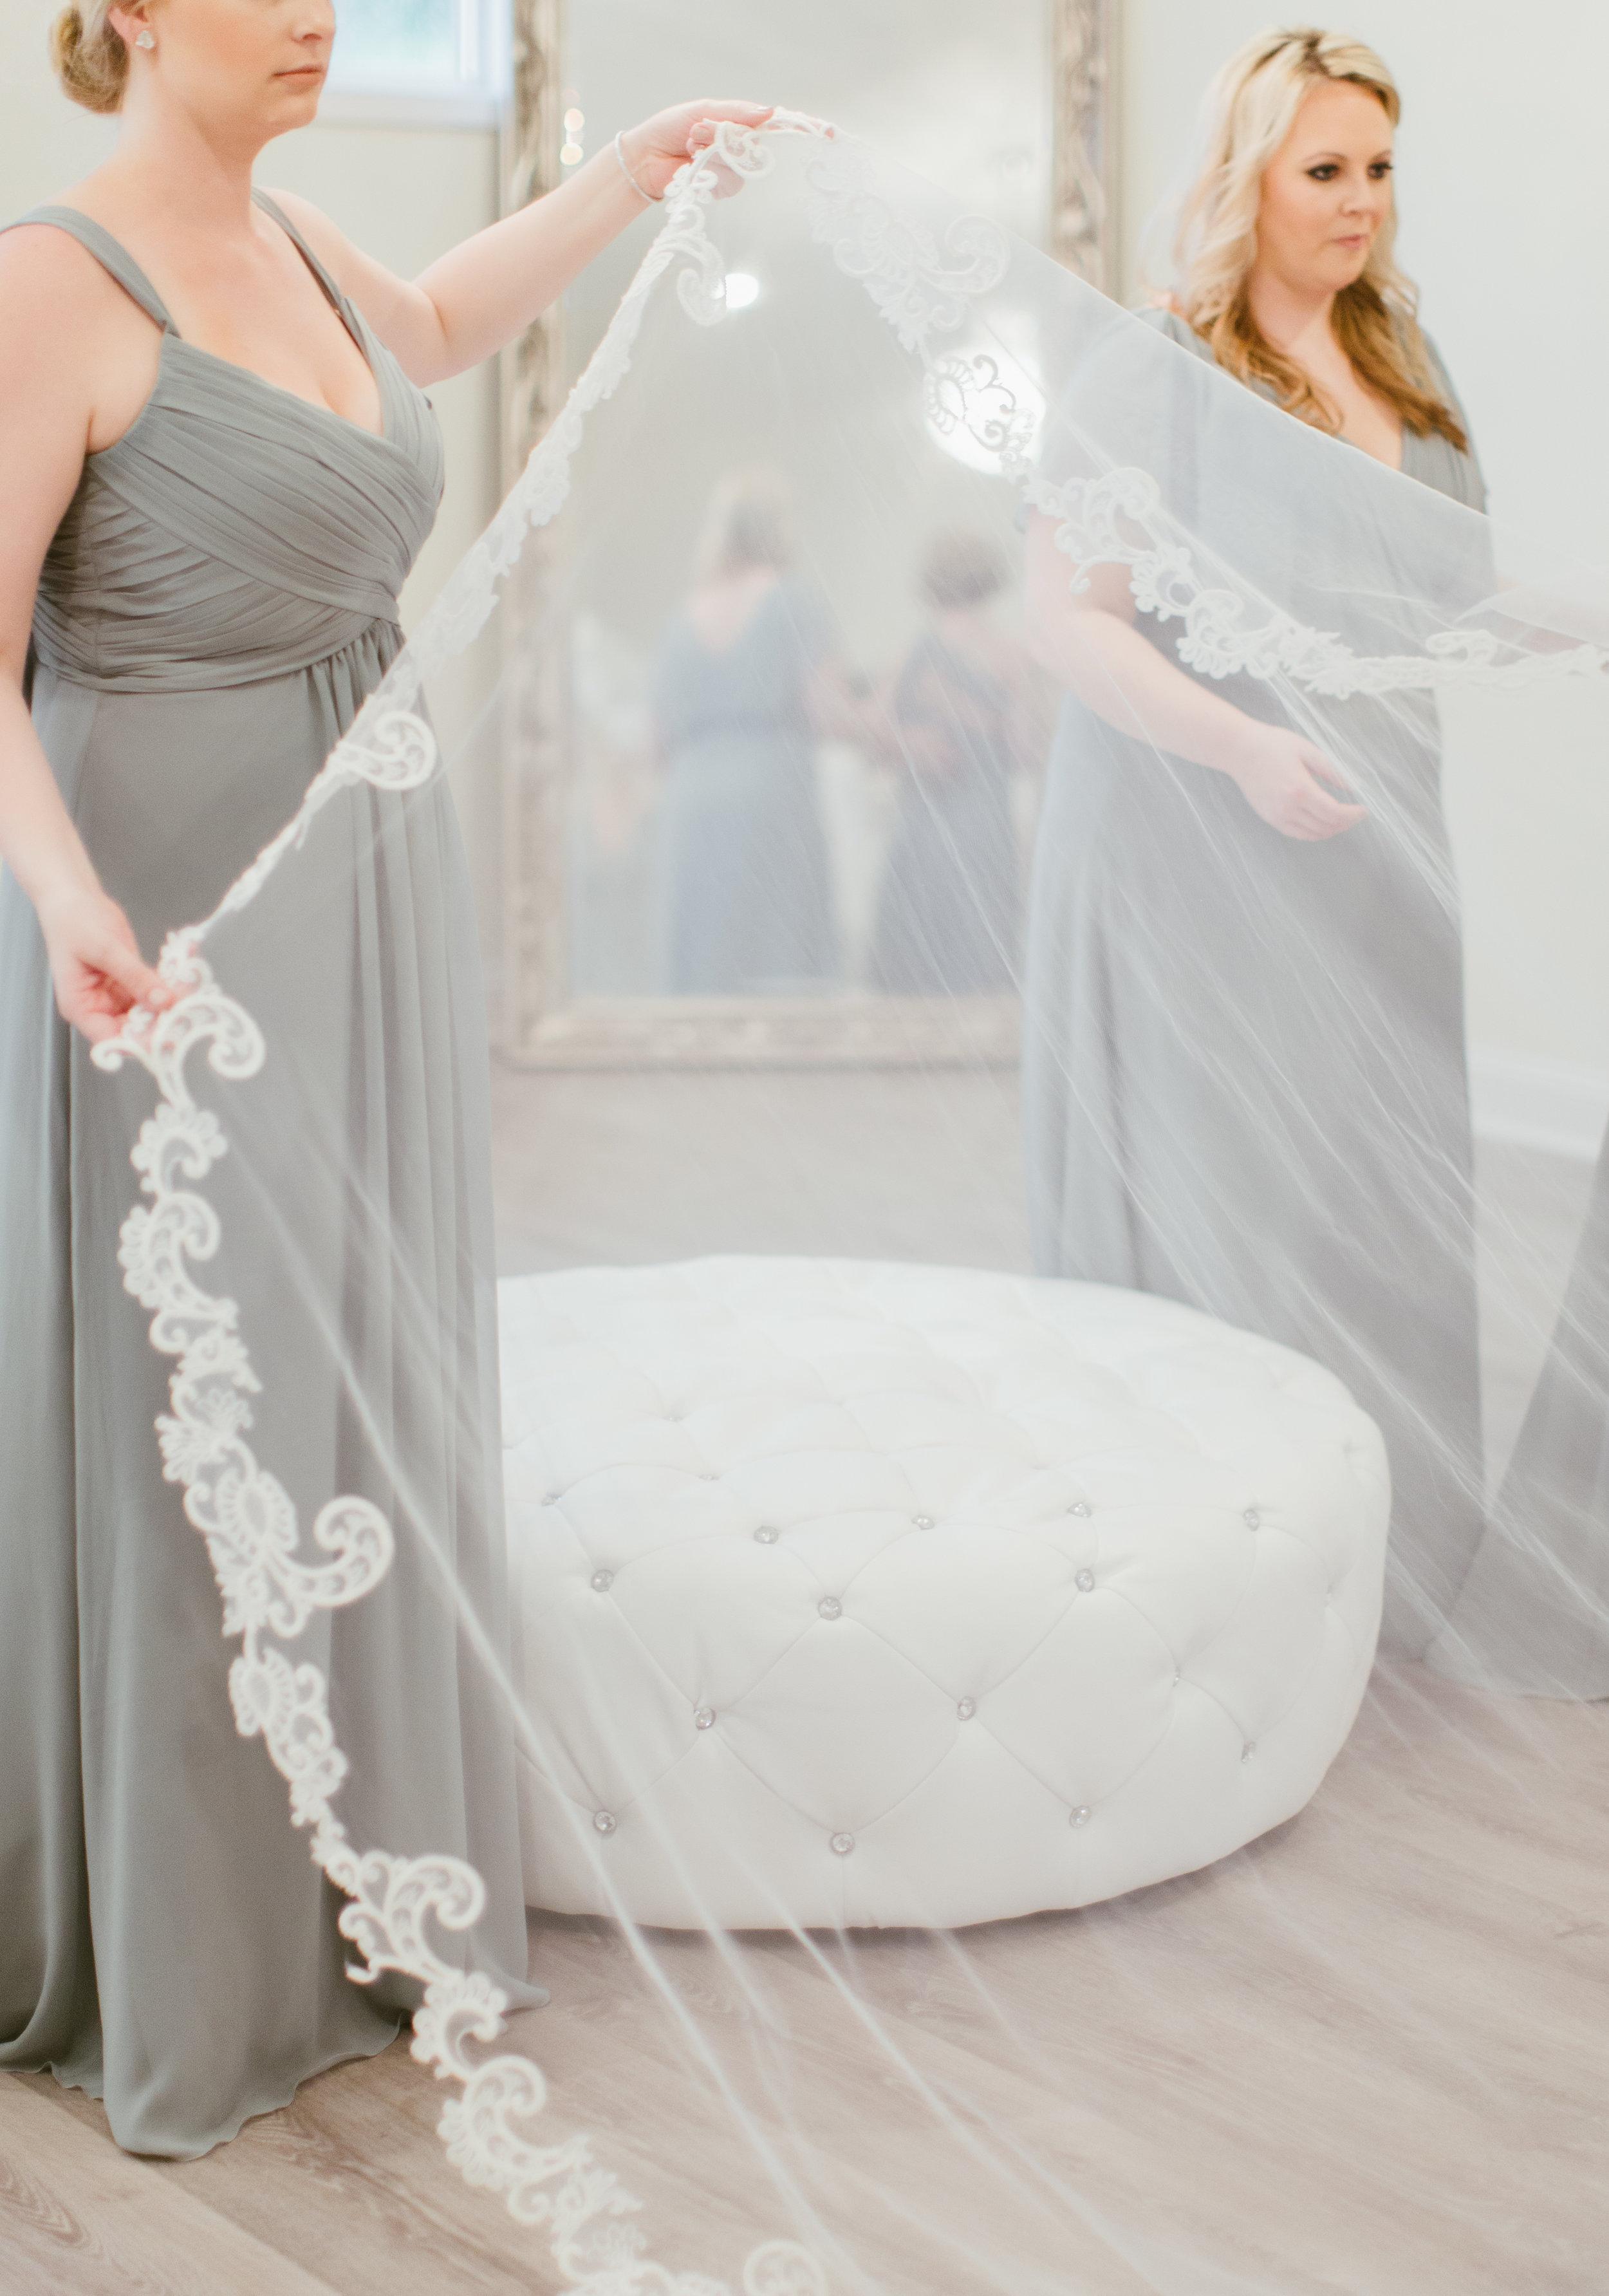 WeddingtonWedding0181.jpg